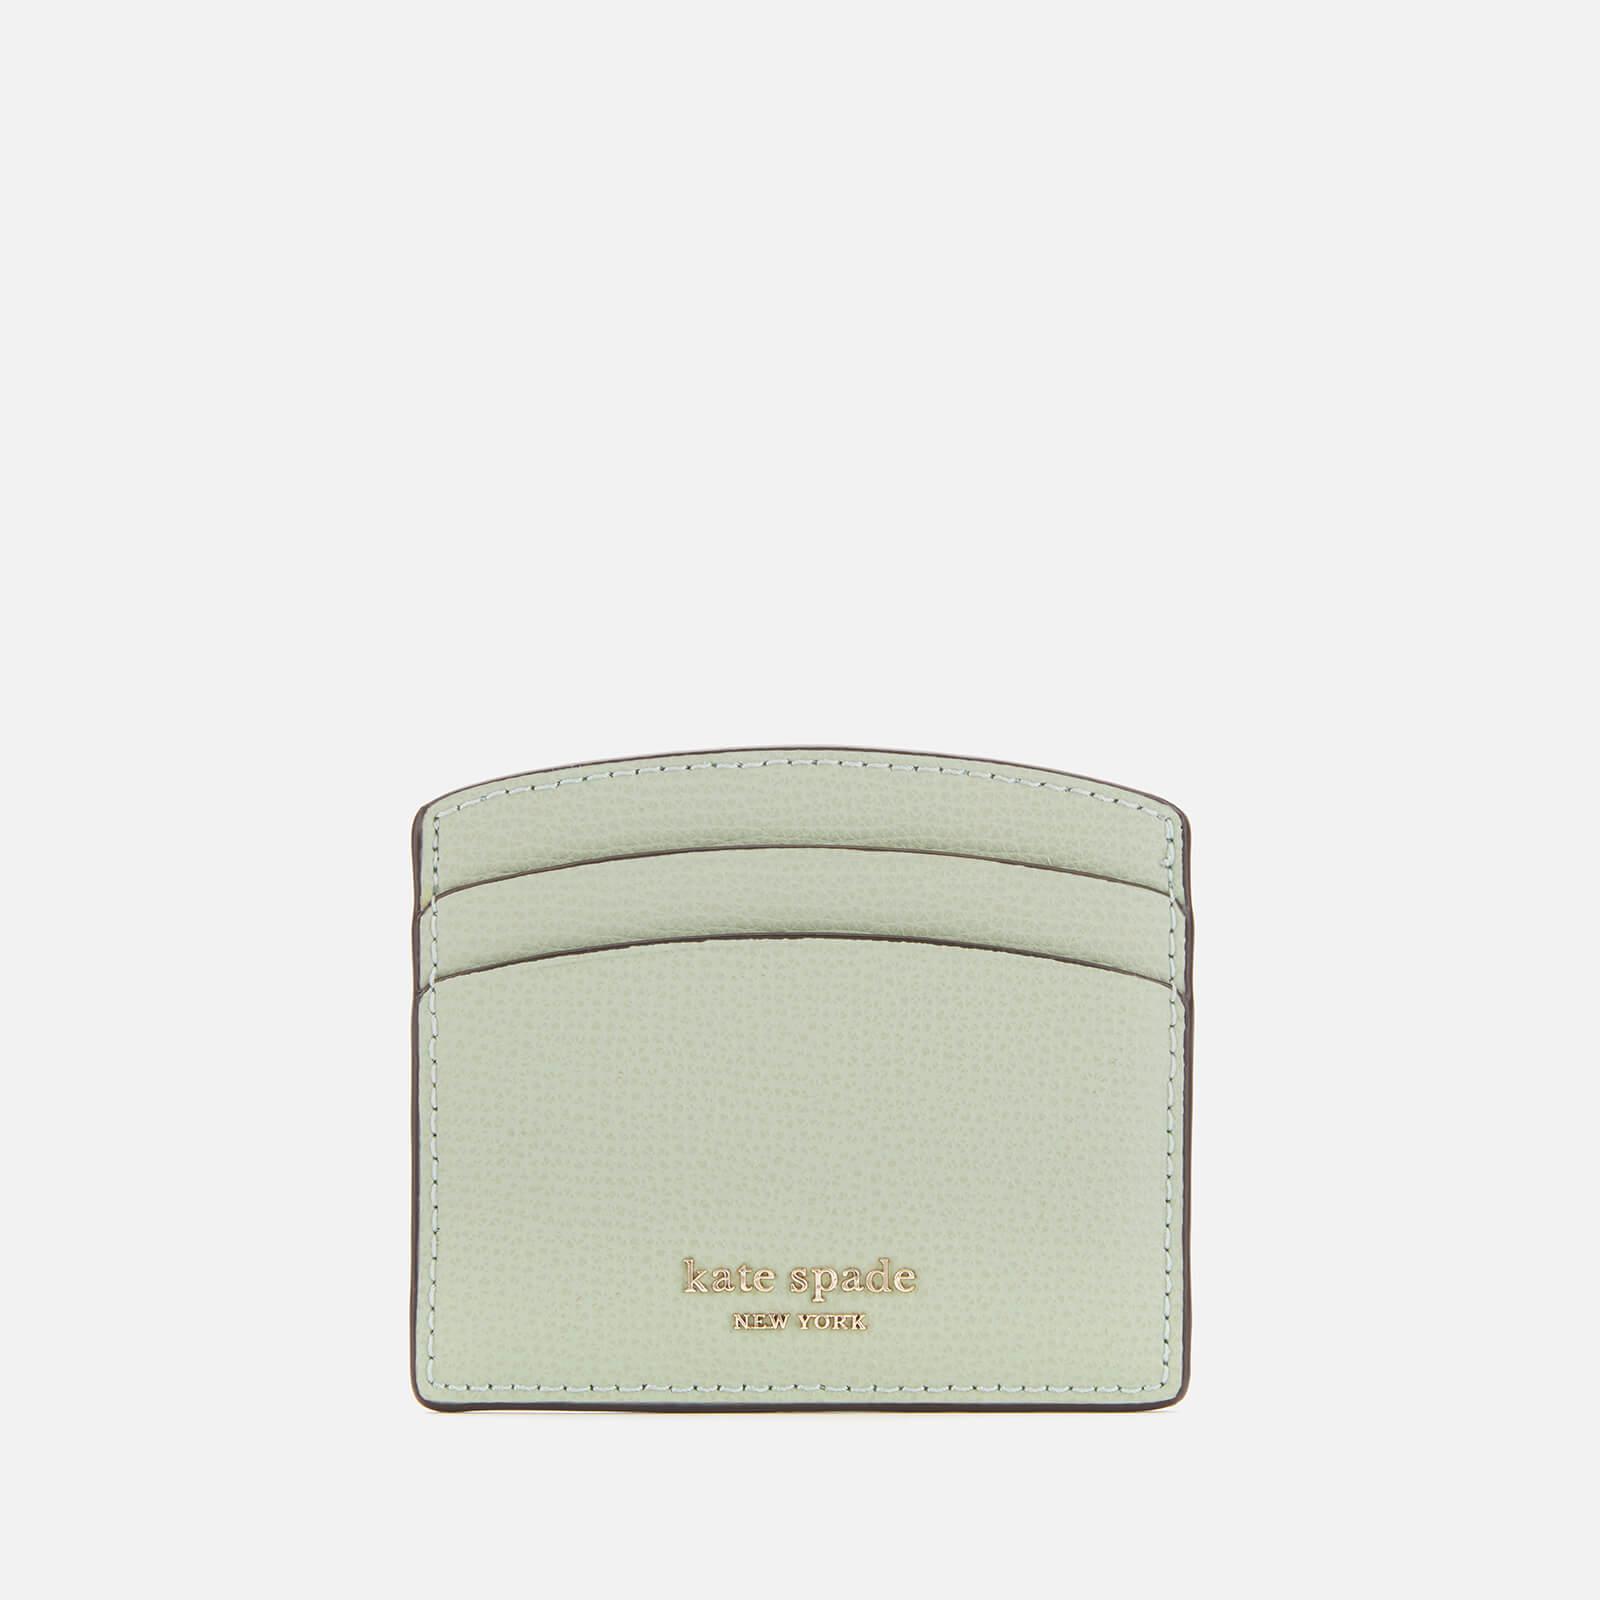 Kate Spade New York Women's Sylvia Card Holder - Pistachio 原價44英鎊 優惠價31